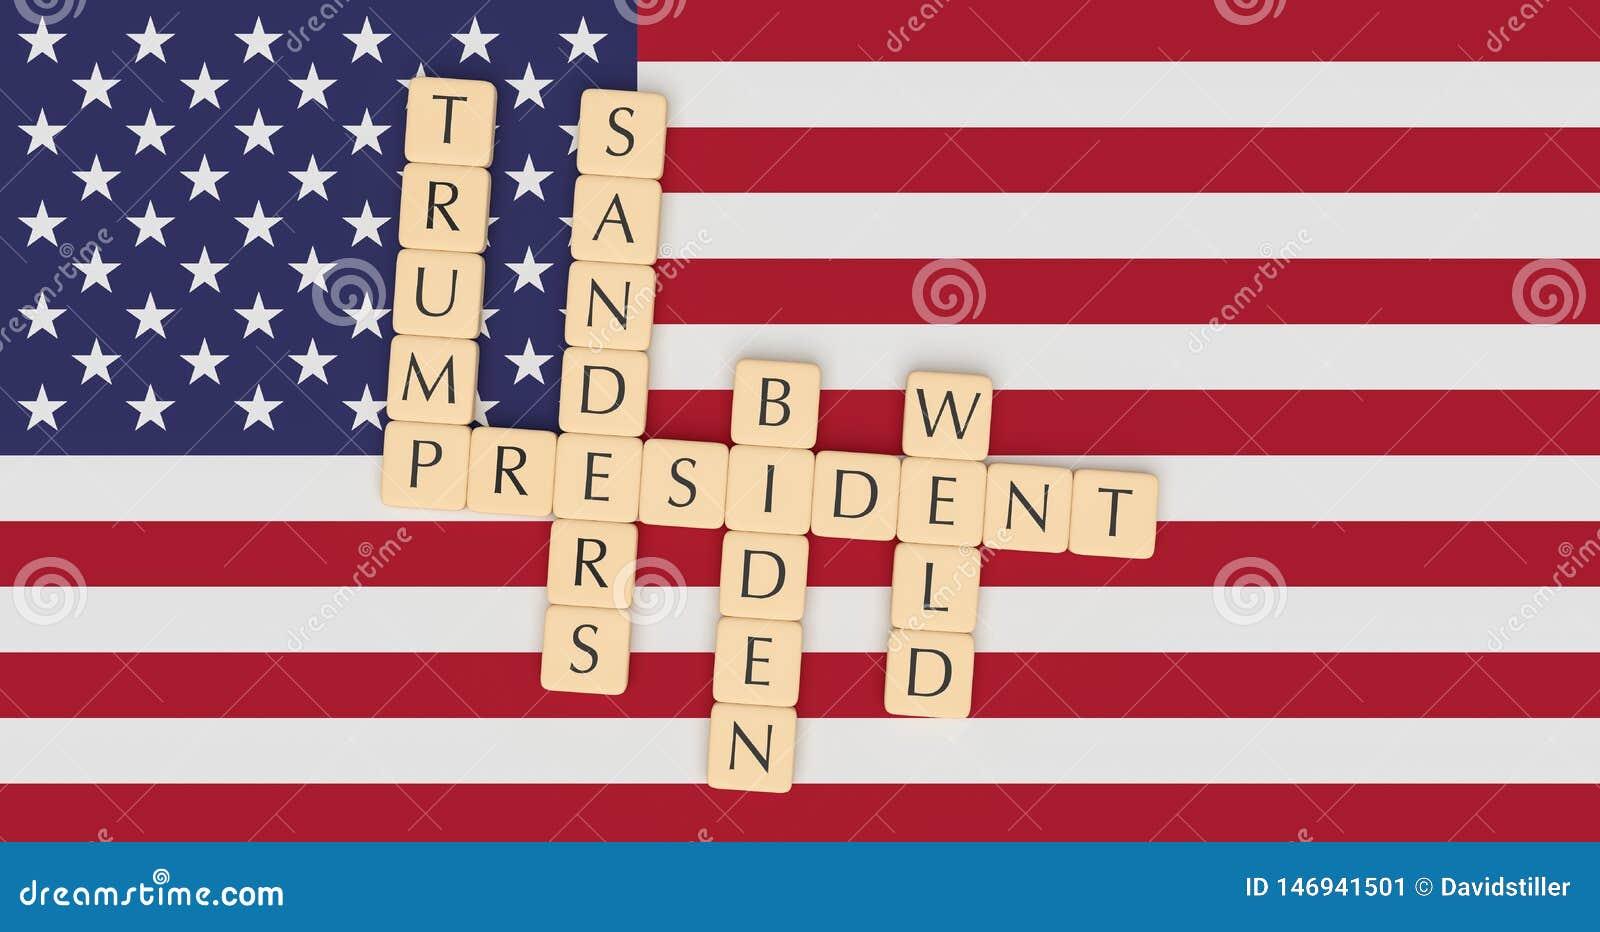 Letter Tiles Major Candidates Running For President In 2020 With US Flag, 3d illustration